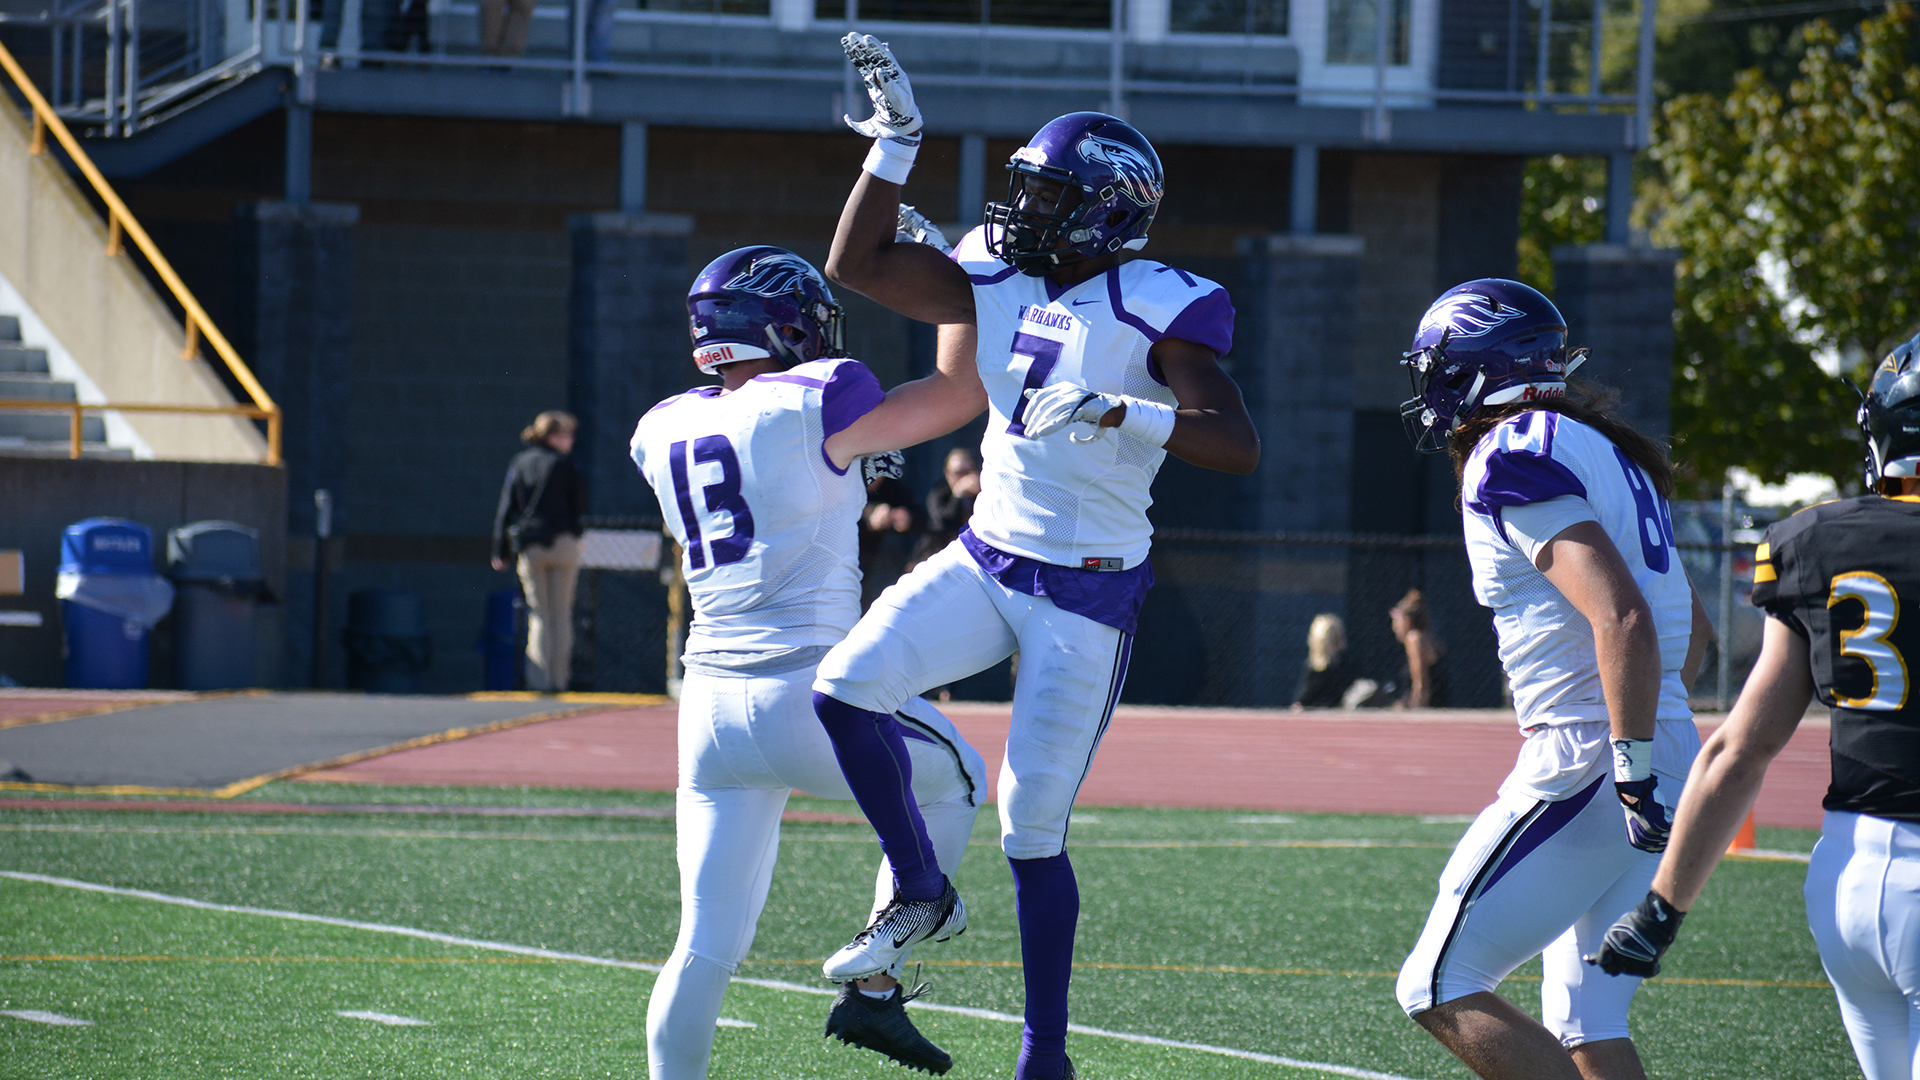 Marcus Hudson - 2017 - Football - University of Wisconsin